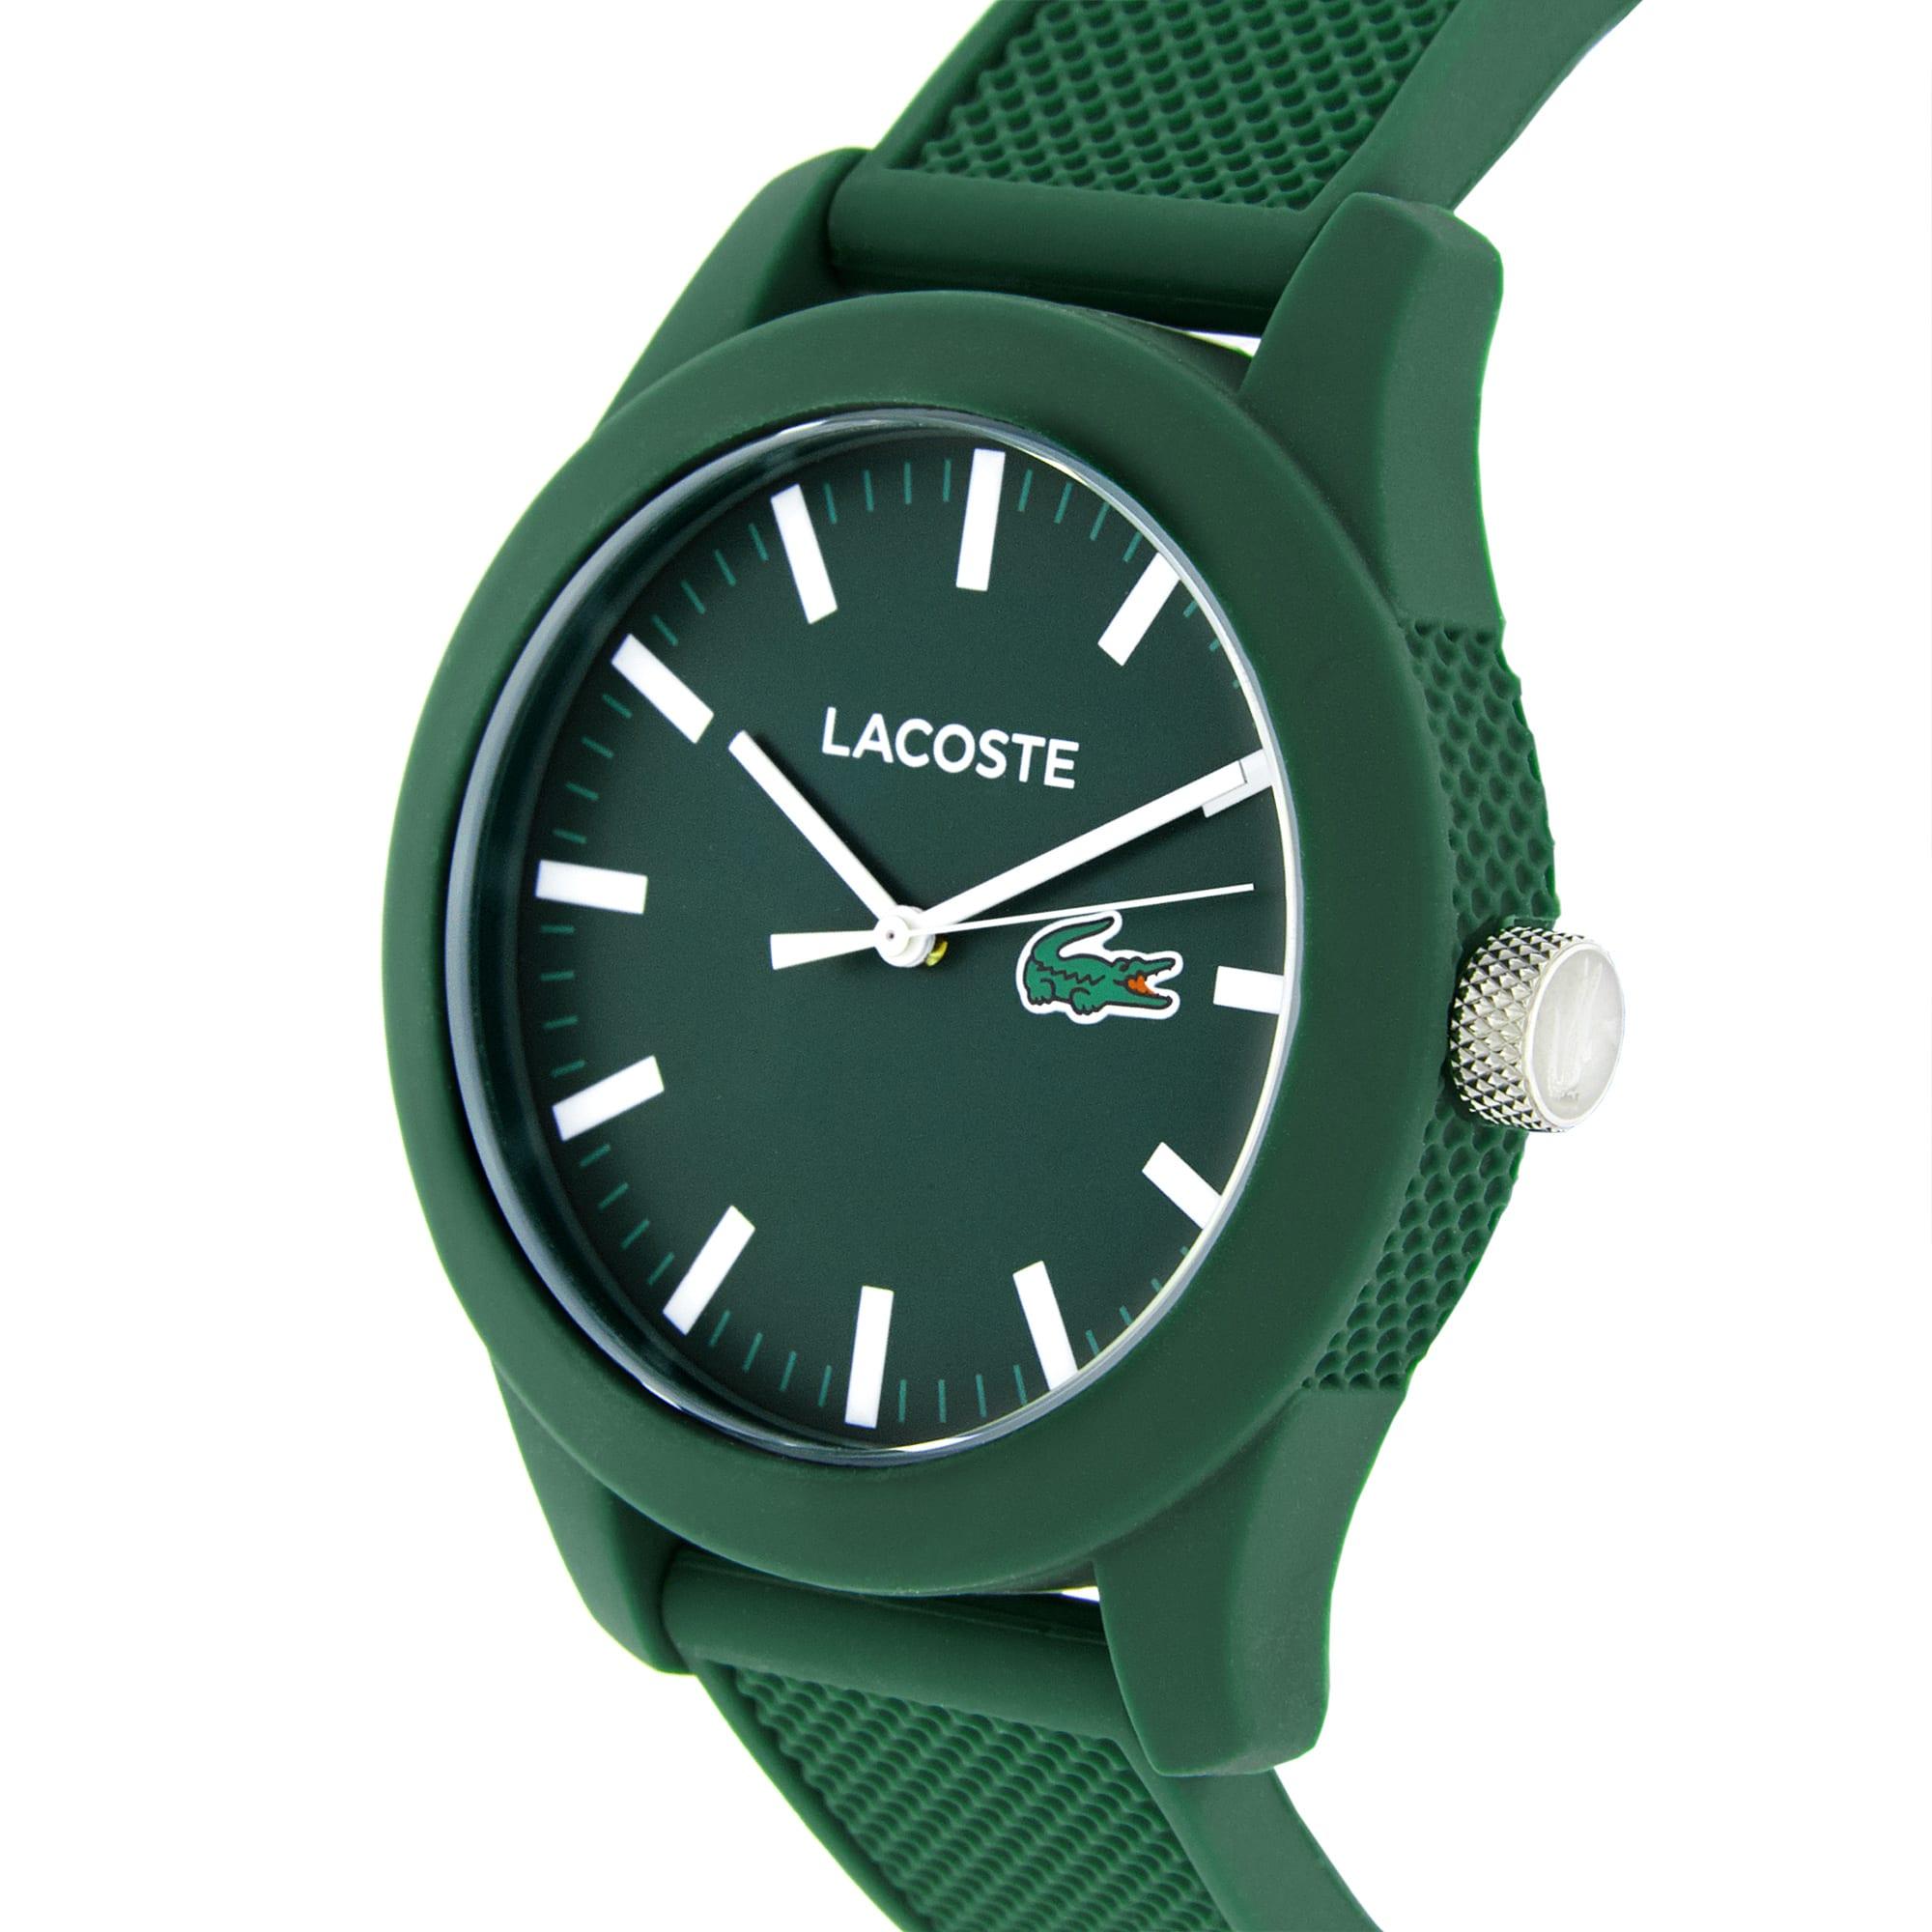 LACOSTE 12.12 Herrenuhr mit grünem Silikonband